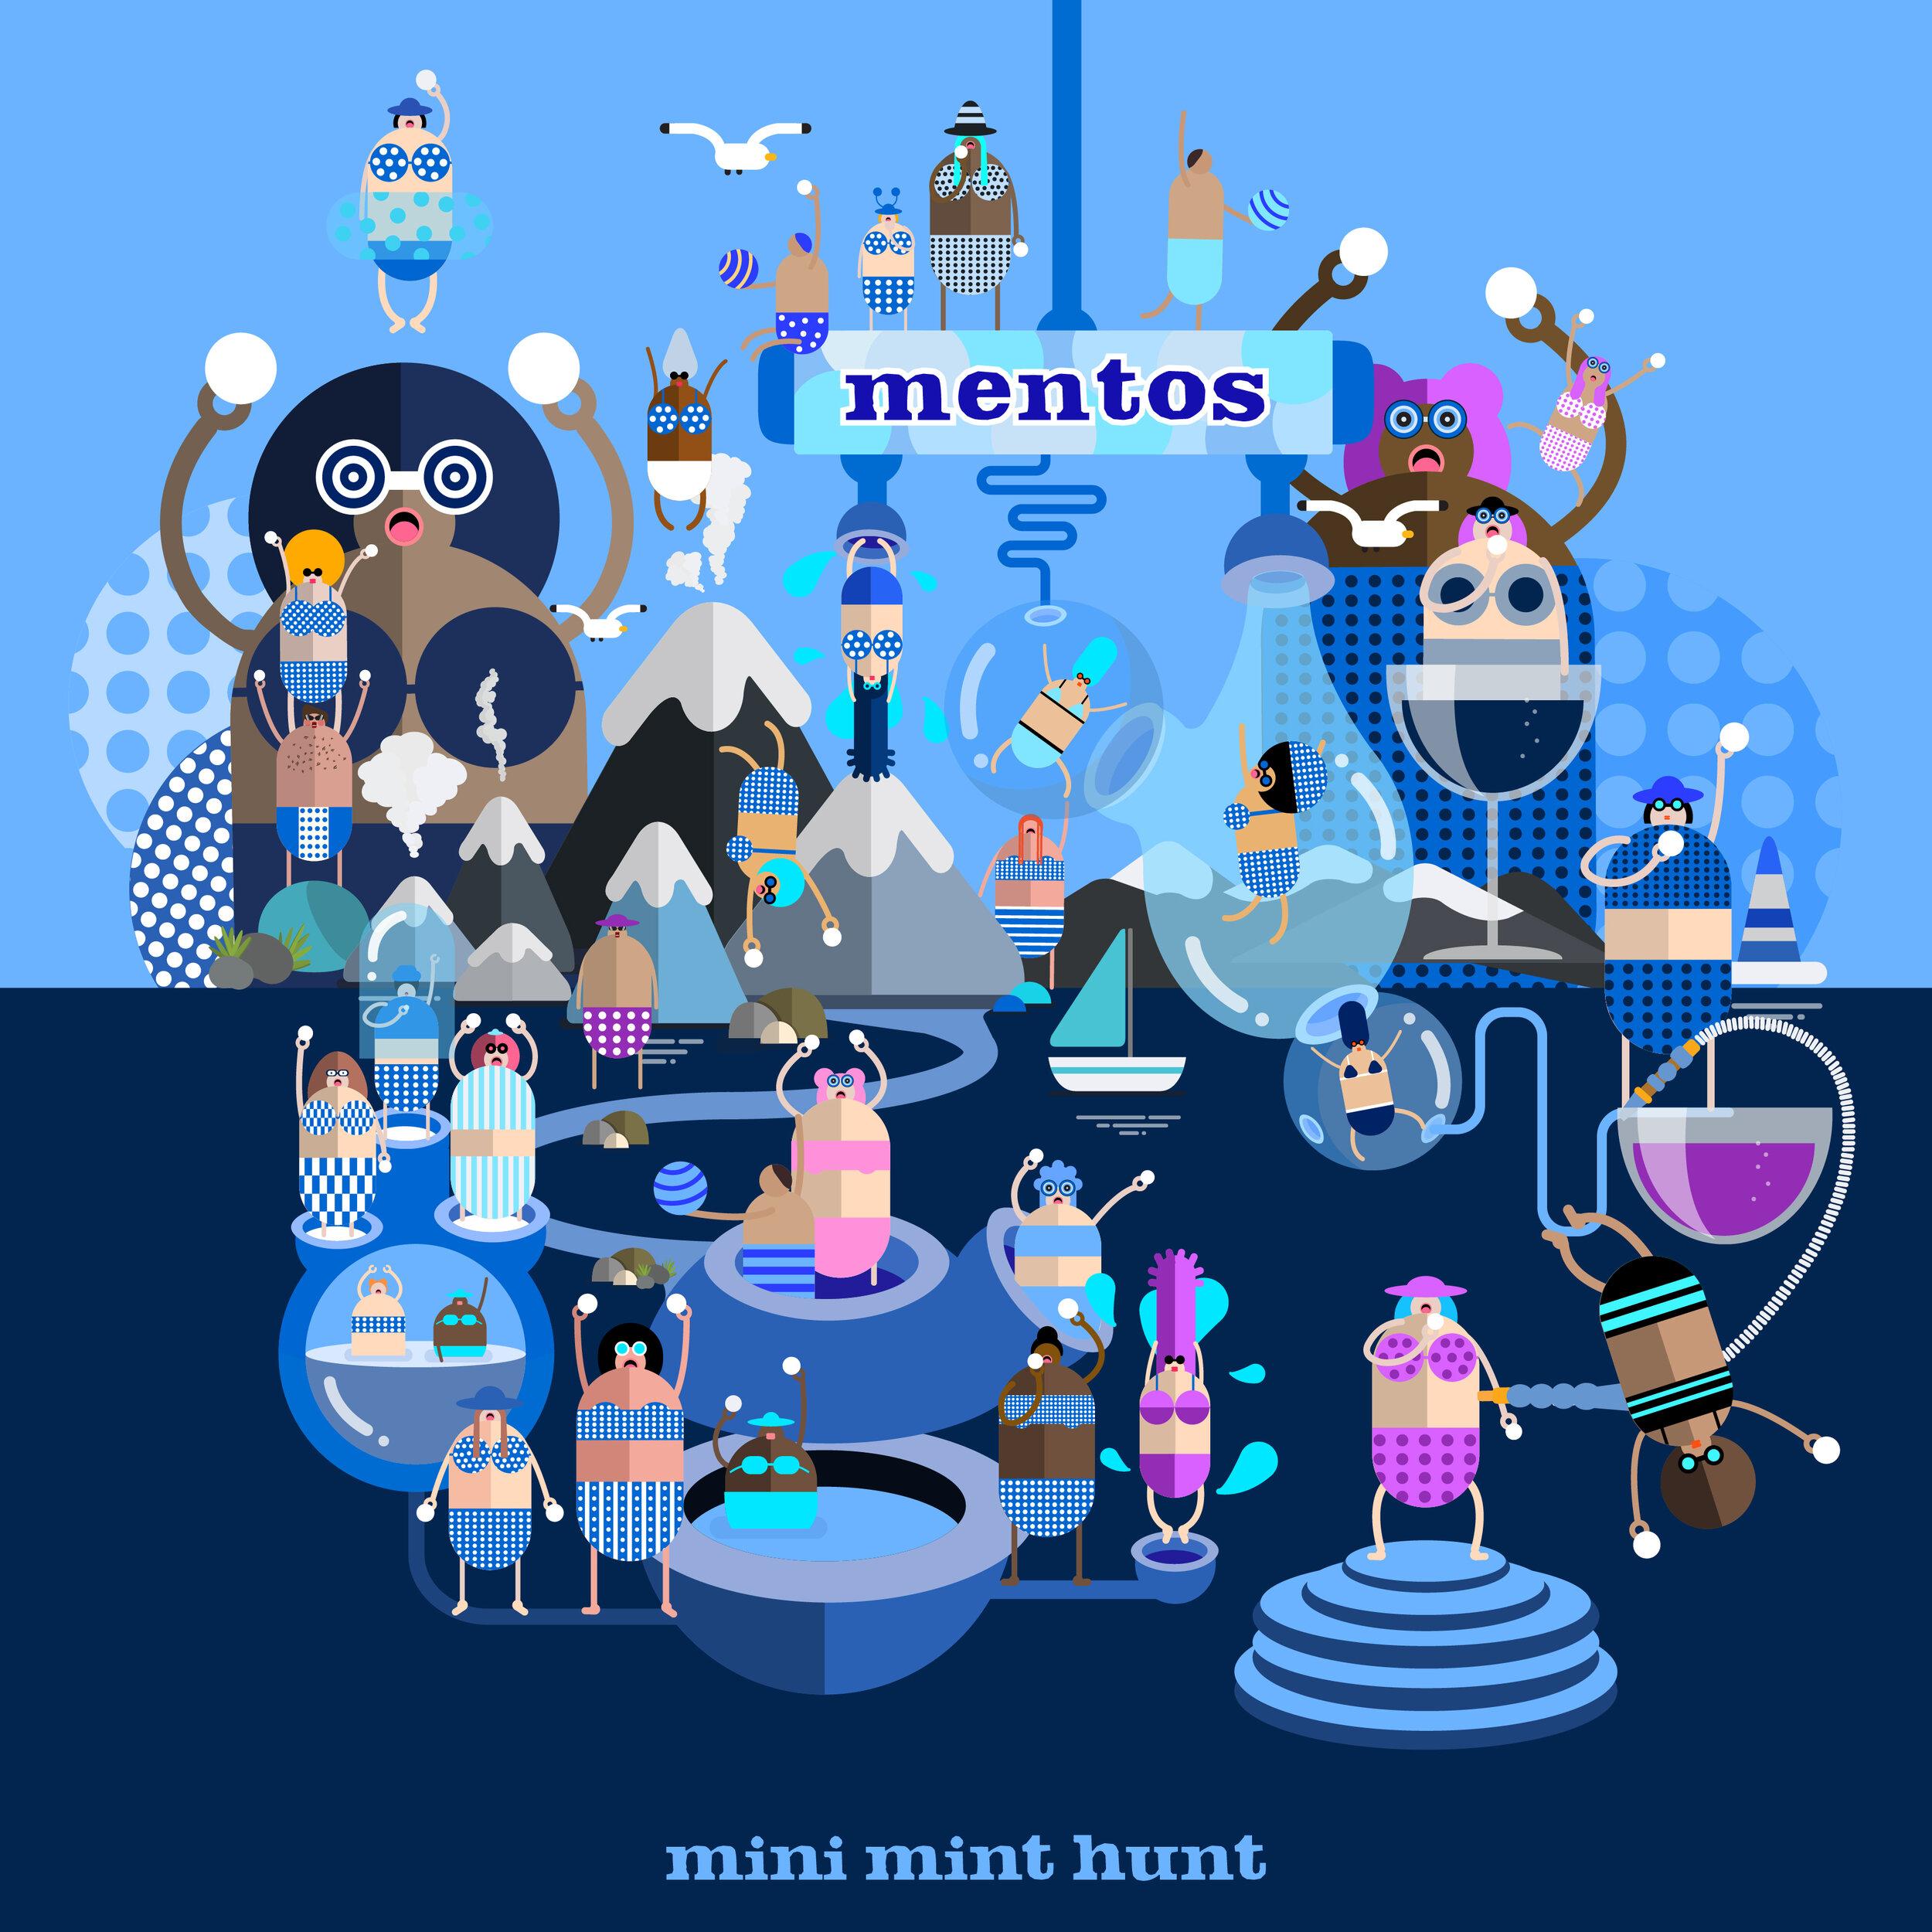 150625-Mentos-Miniminthunt-02.jpg